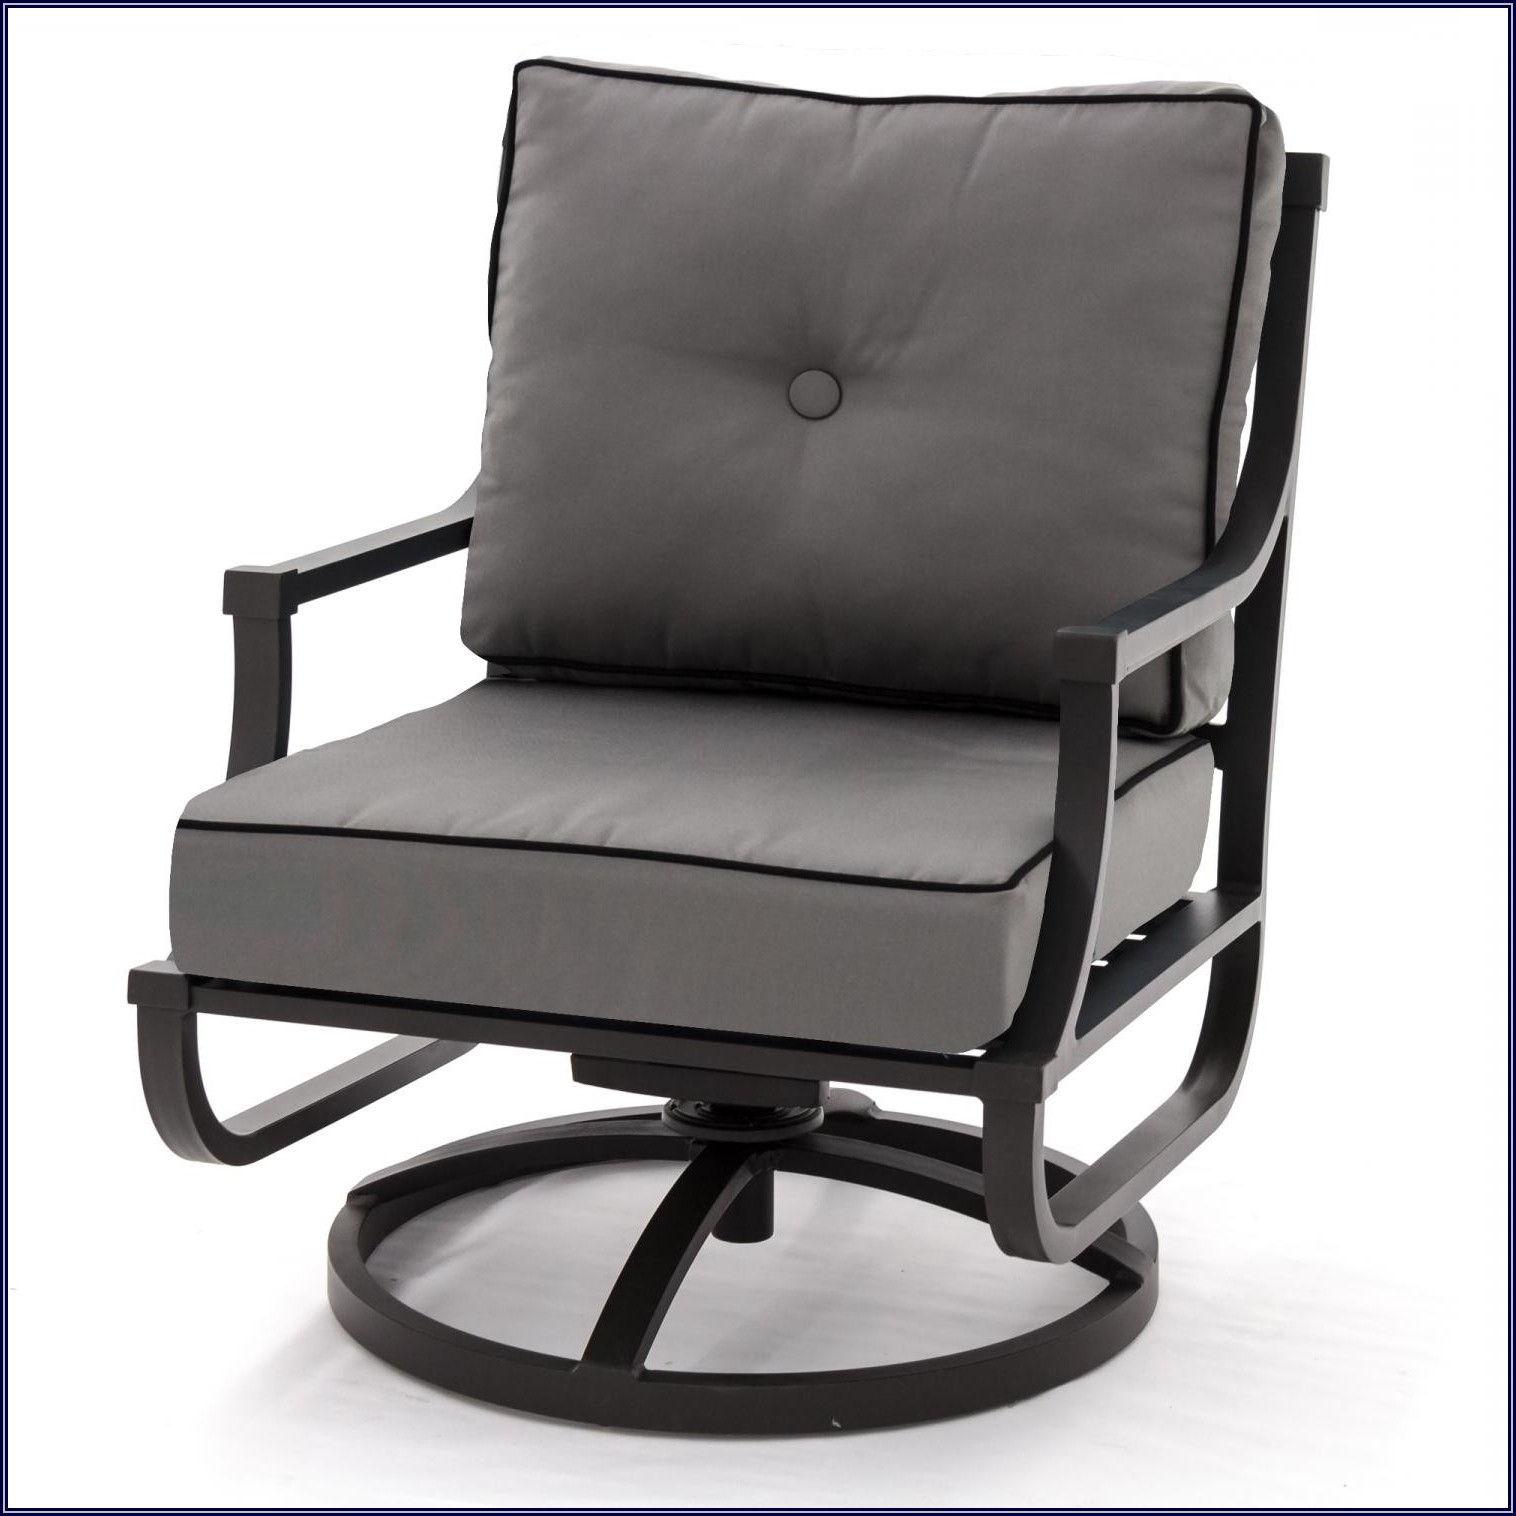 Hampton Bay Swivel Rocker Patio Chairs